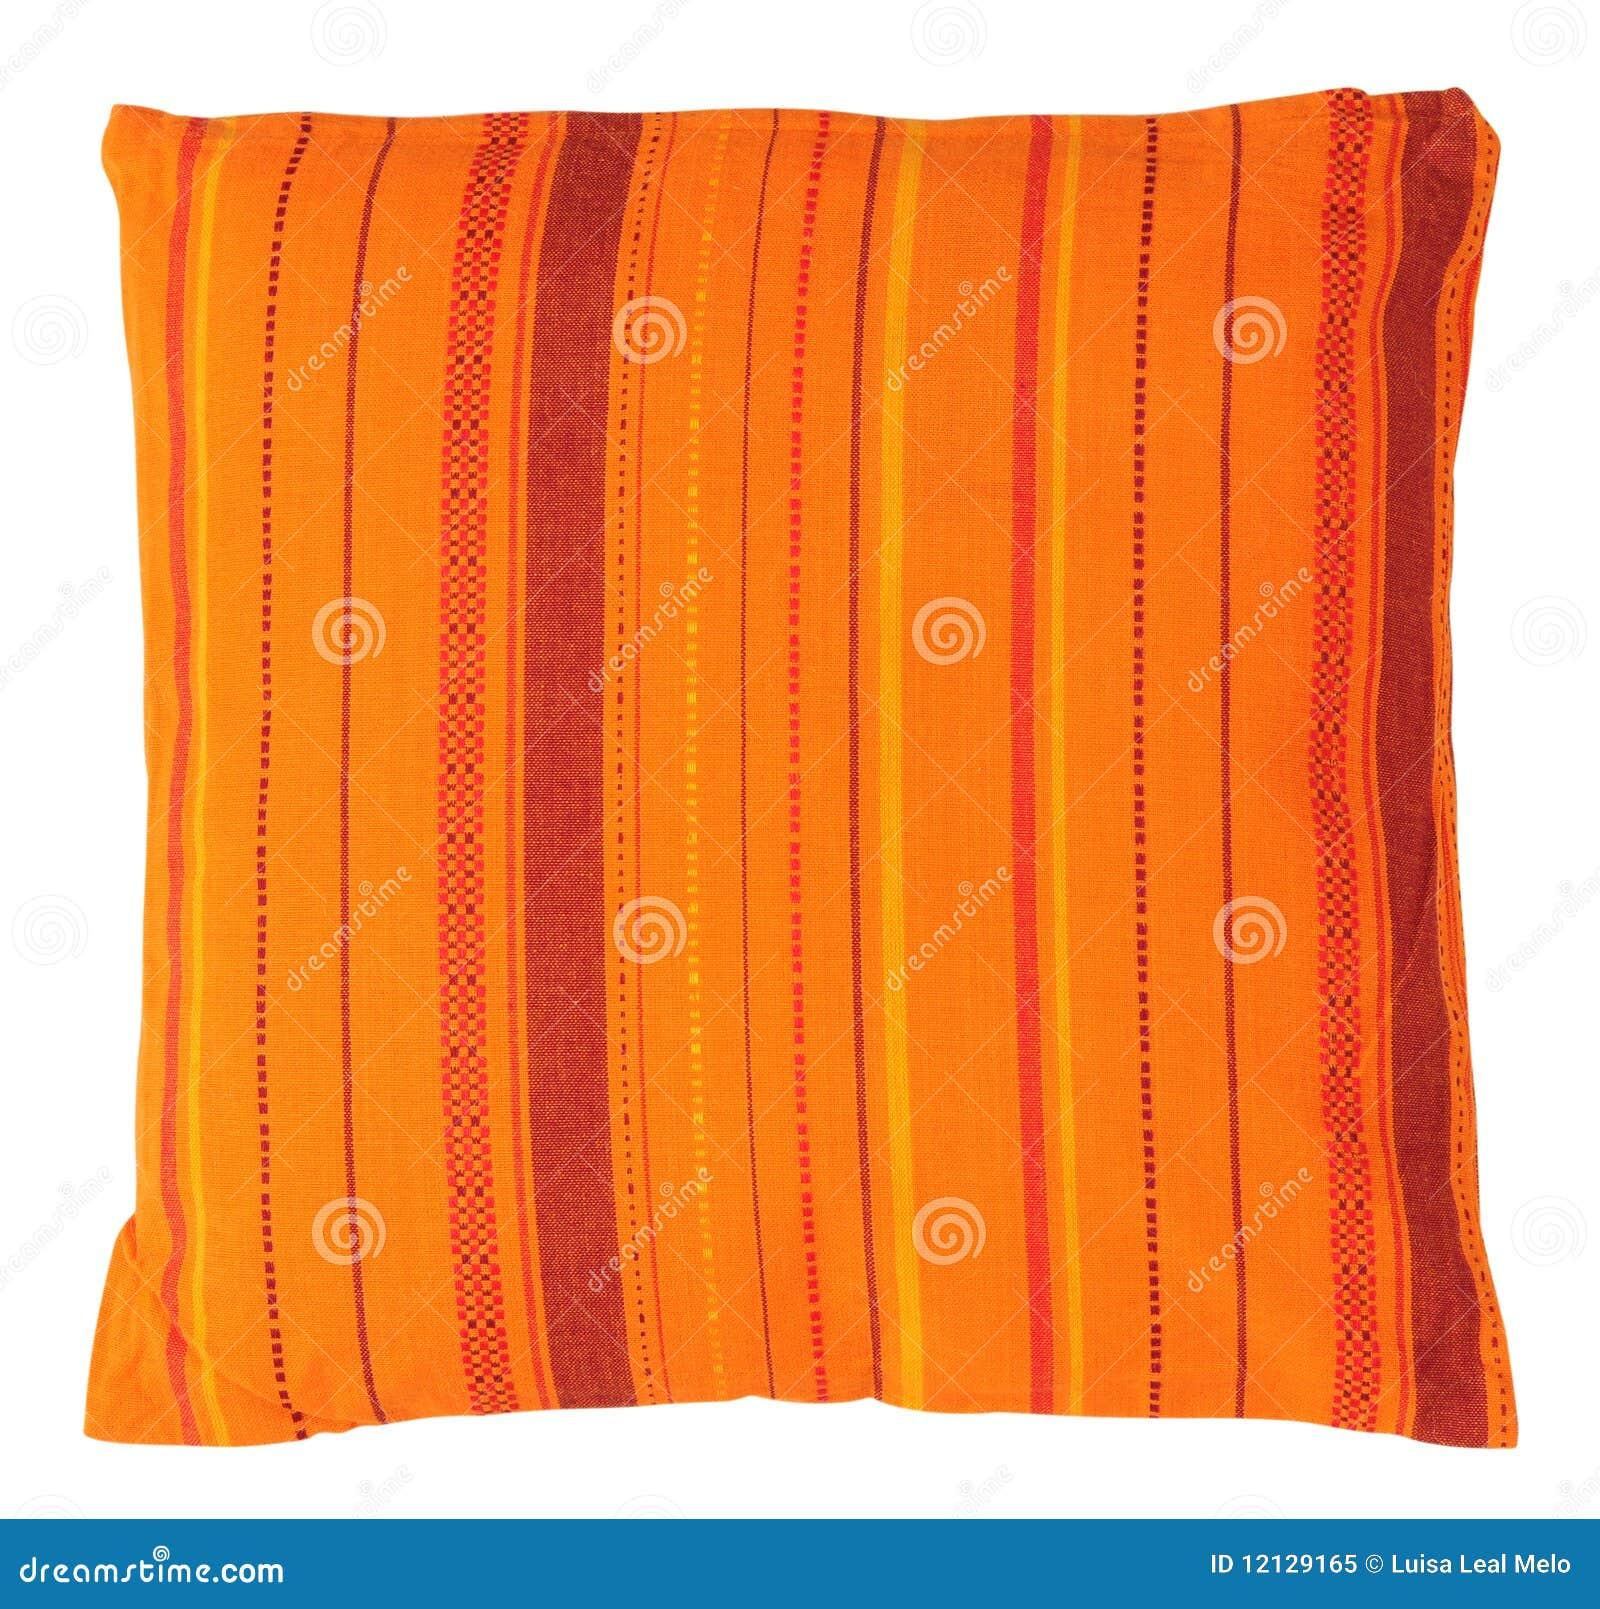 Almohadilla anaranjada. Aislado